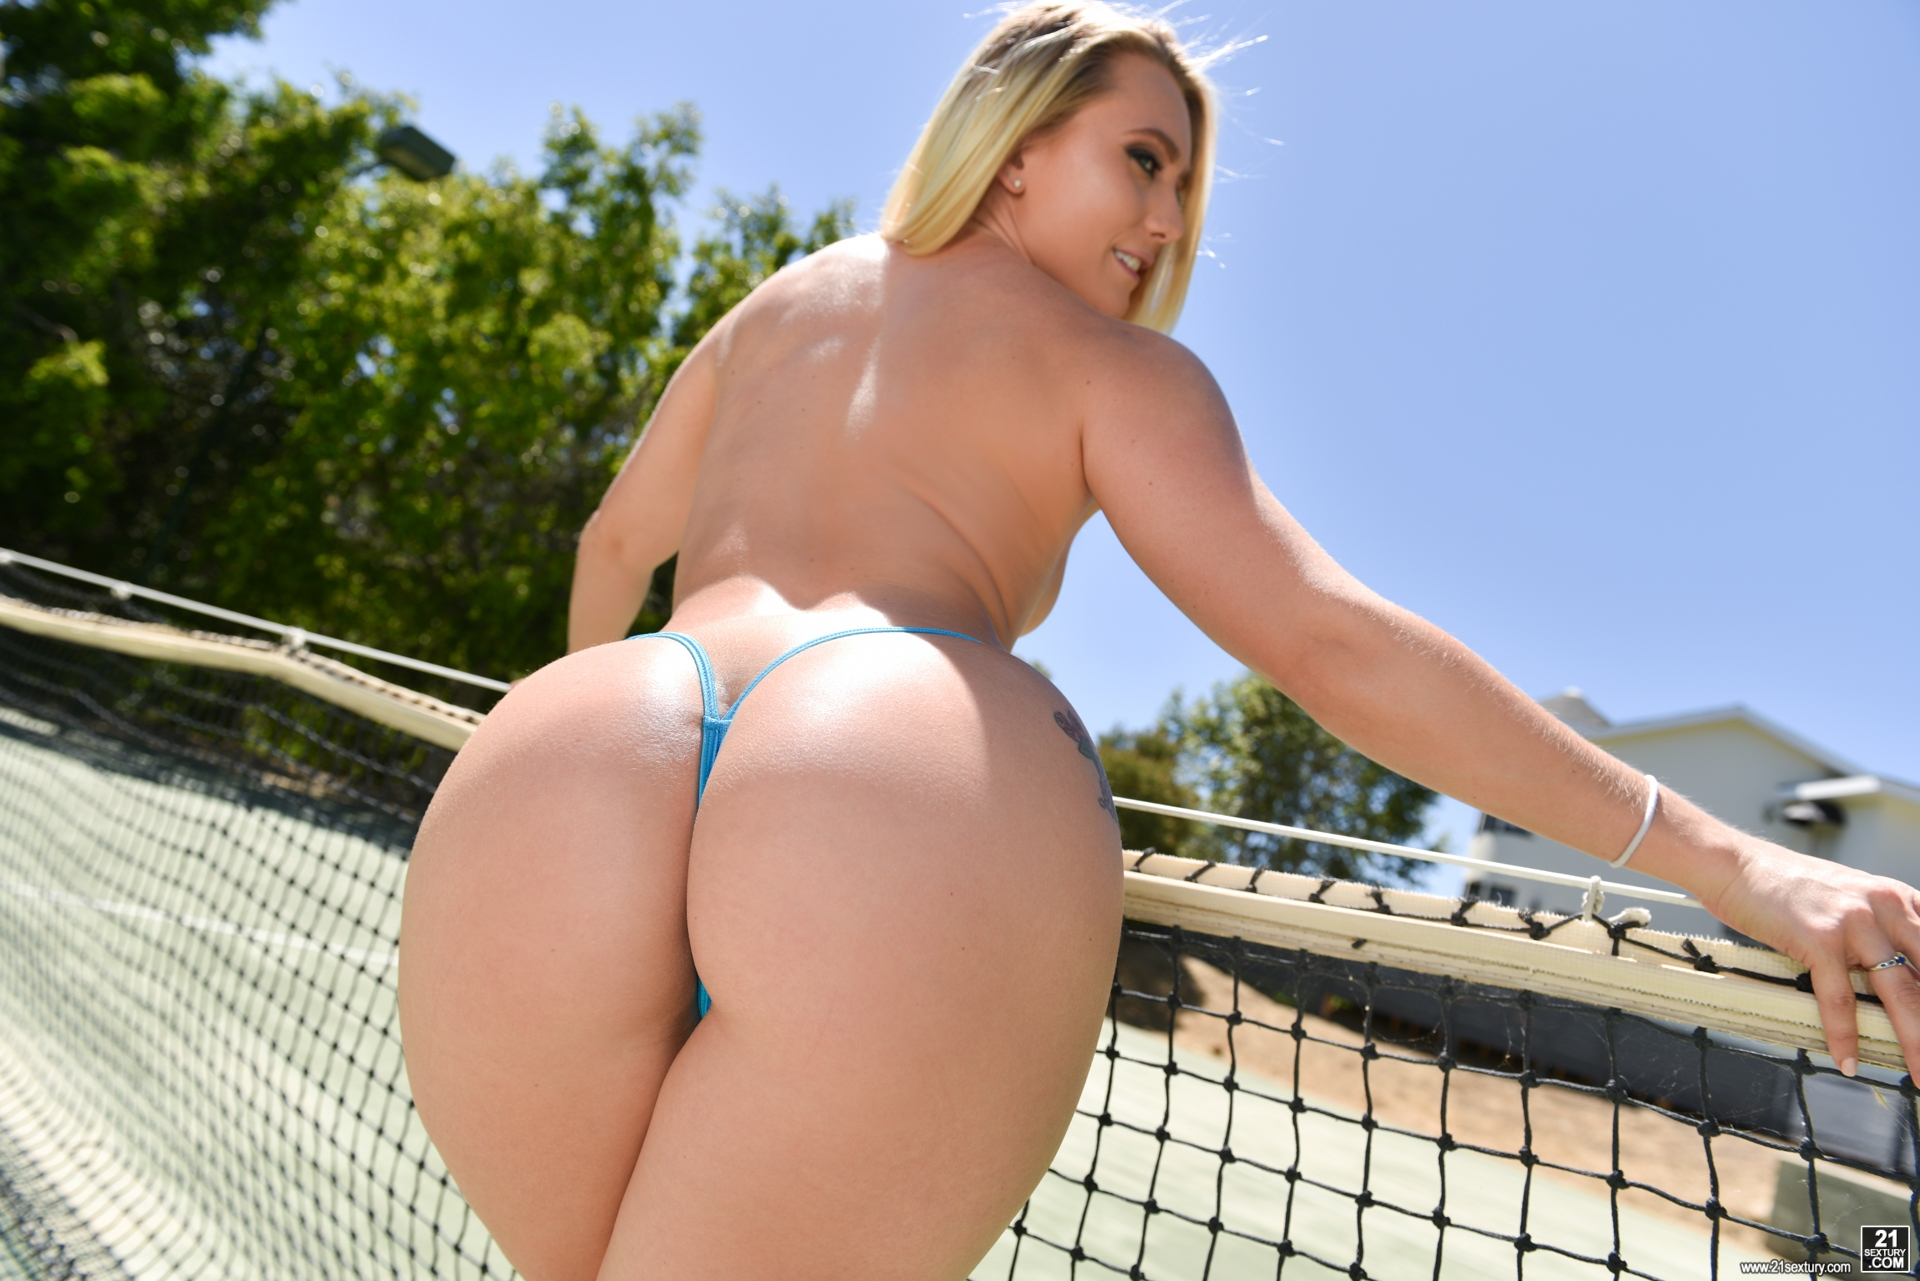 Amateur Big Butt Free Tgp